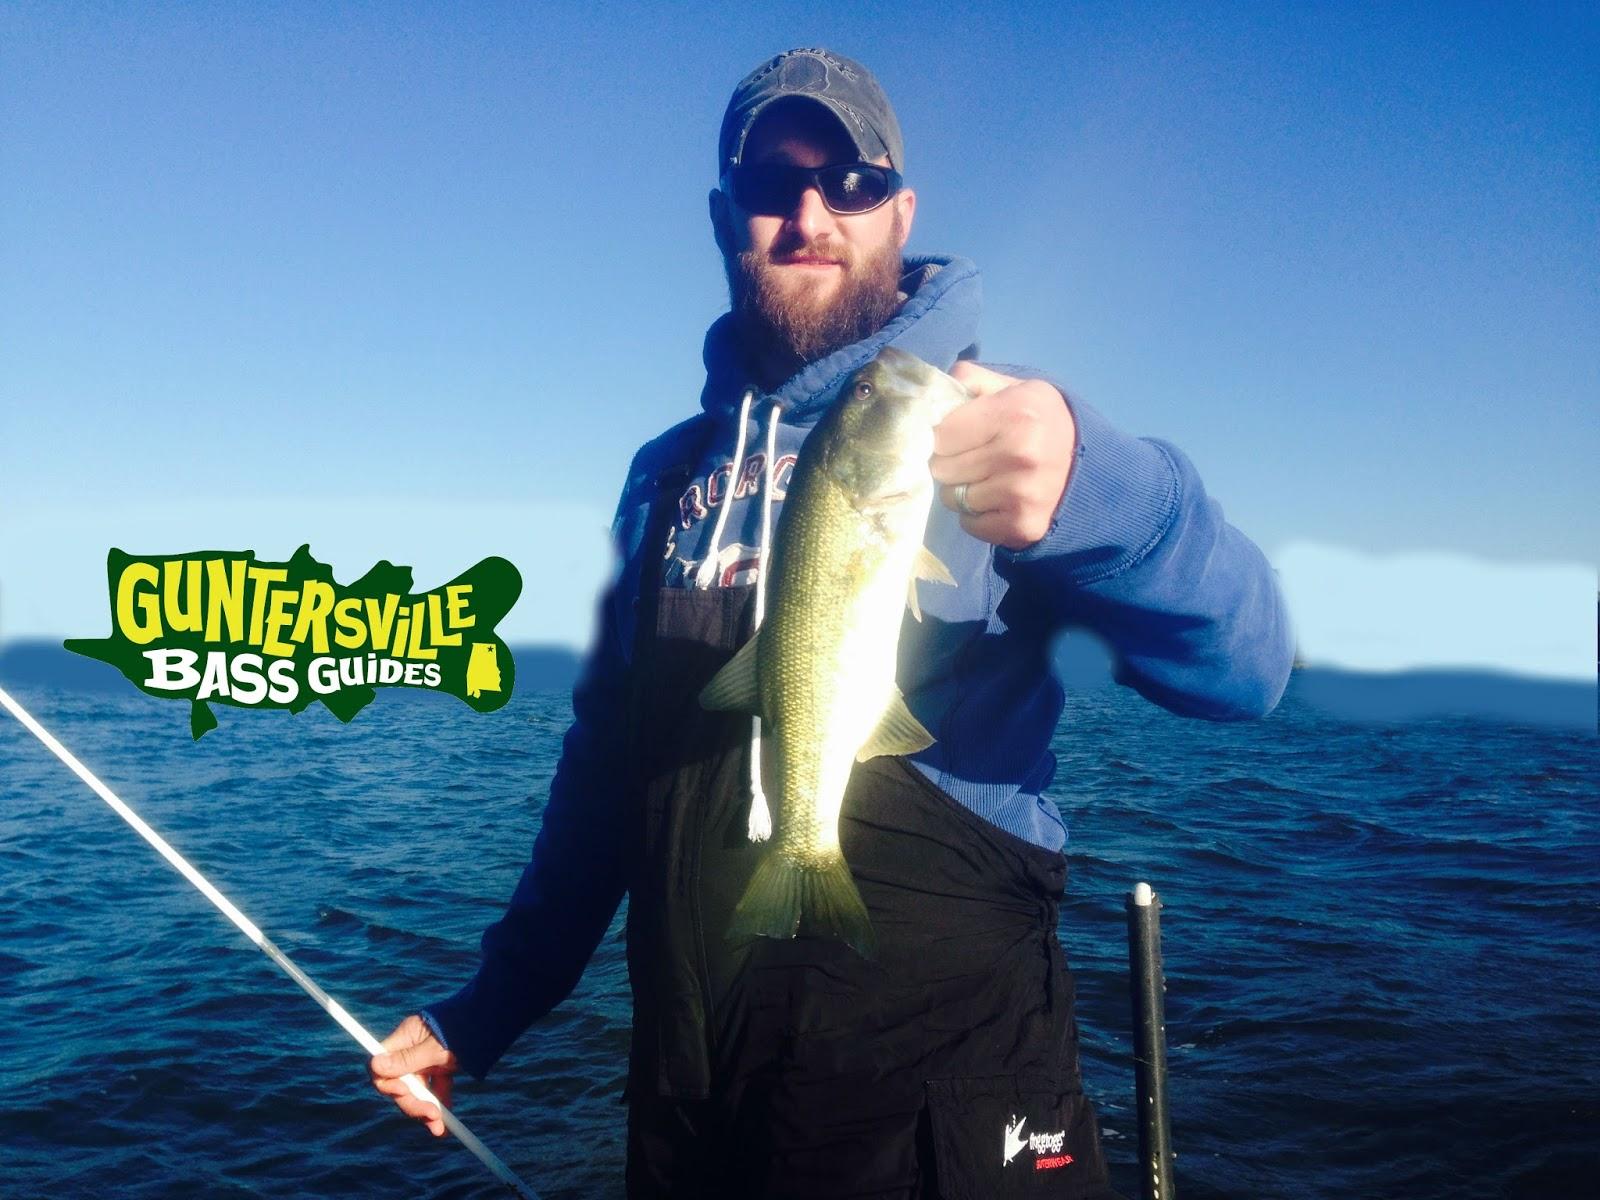 Lake guntersville fishing report guntersville bass guides for Fishing forecast alabama